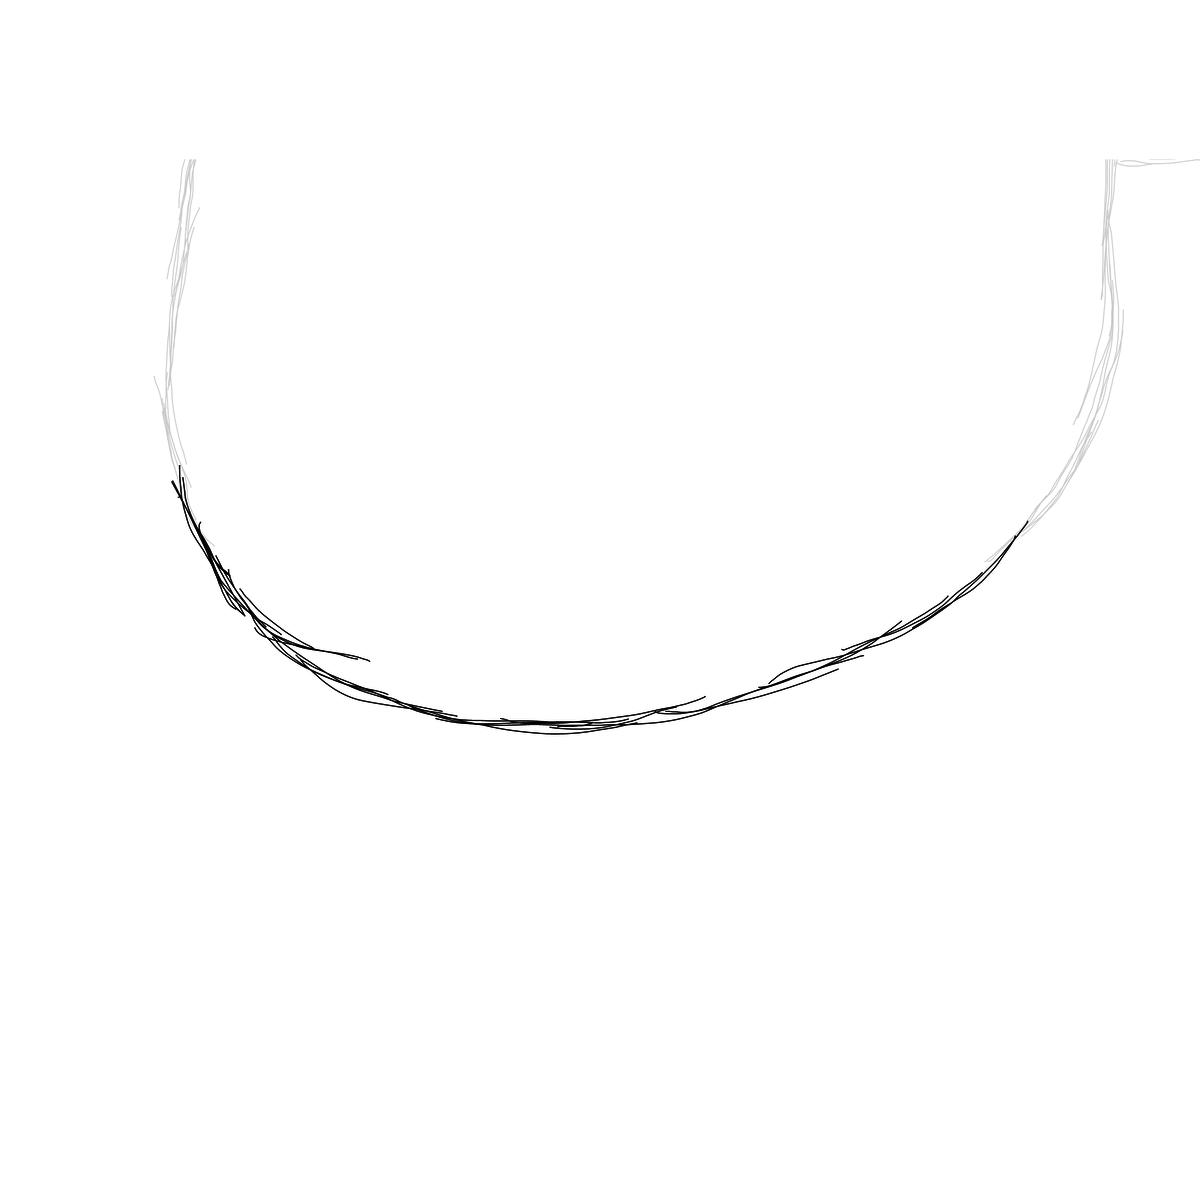 BAAAM drawing#18903 lat:-23.5478935241699220lng: -46.6354942321777340